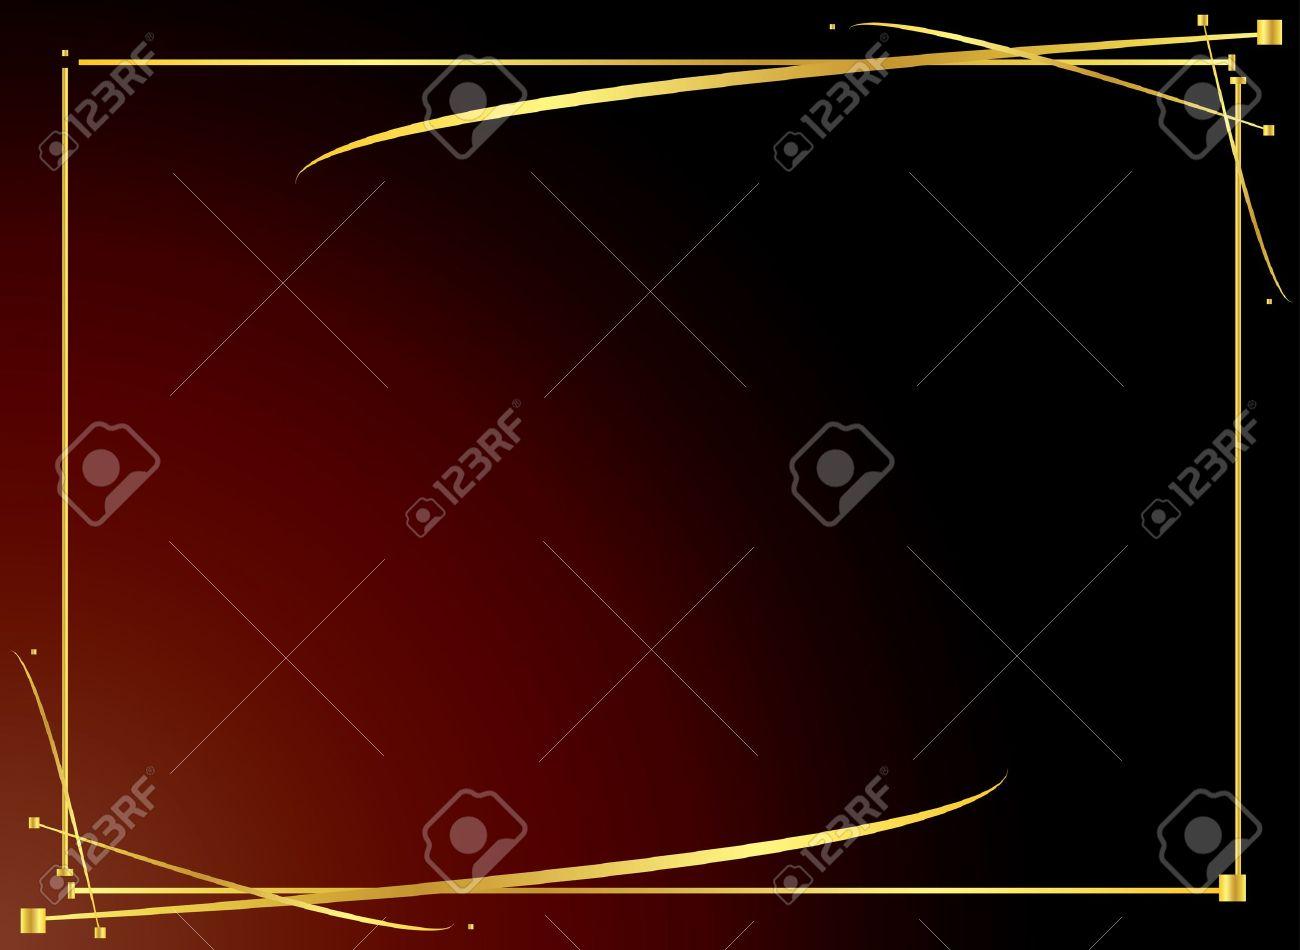 Elegant gold frame on a red gradient background - 3501953